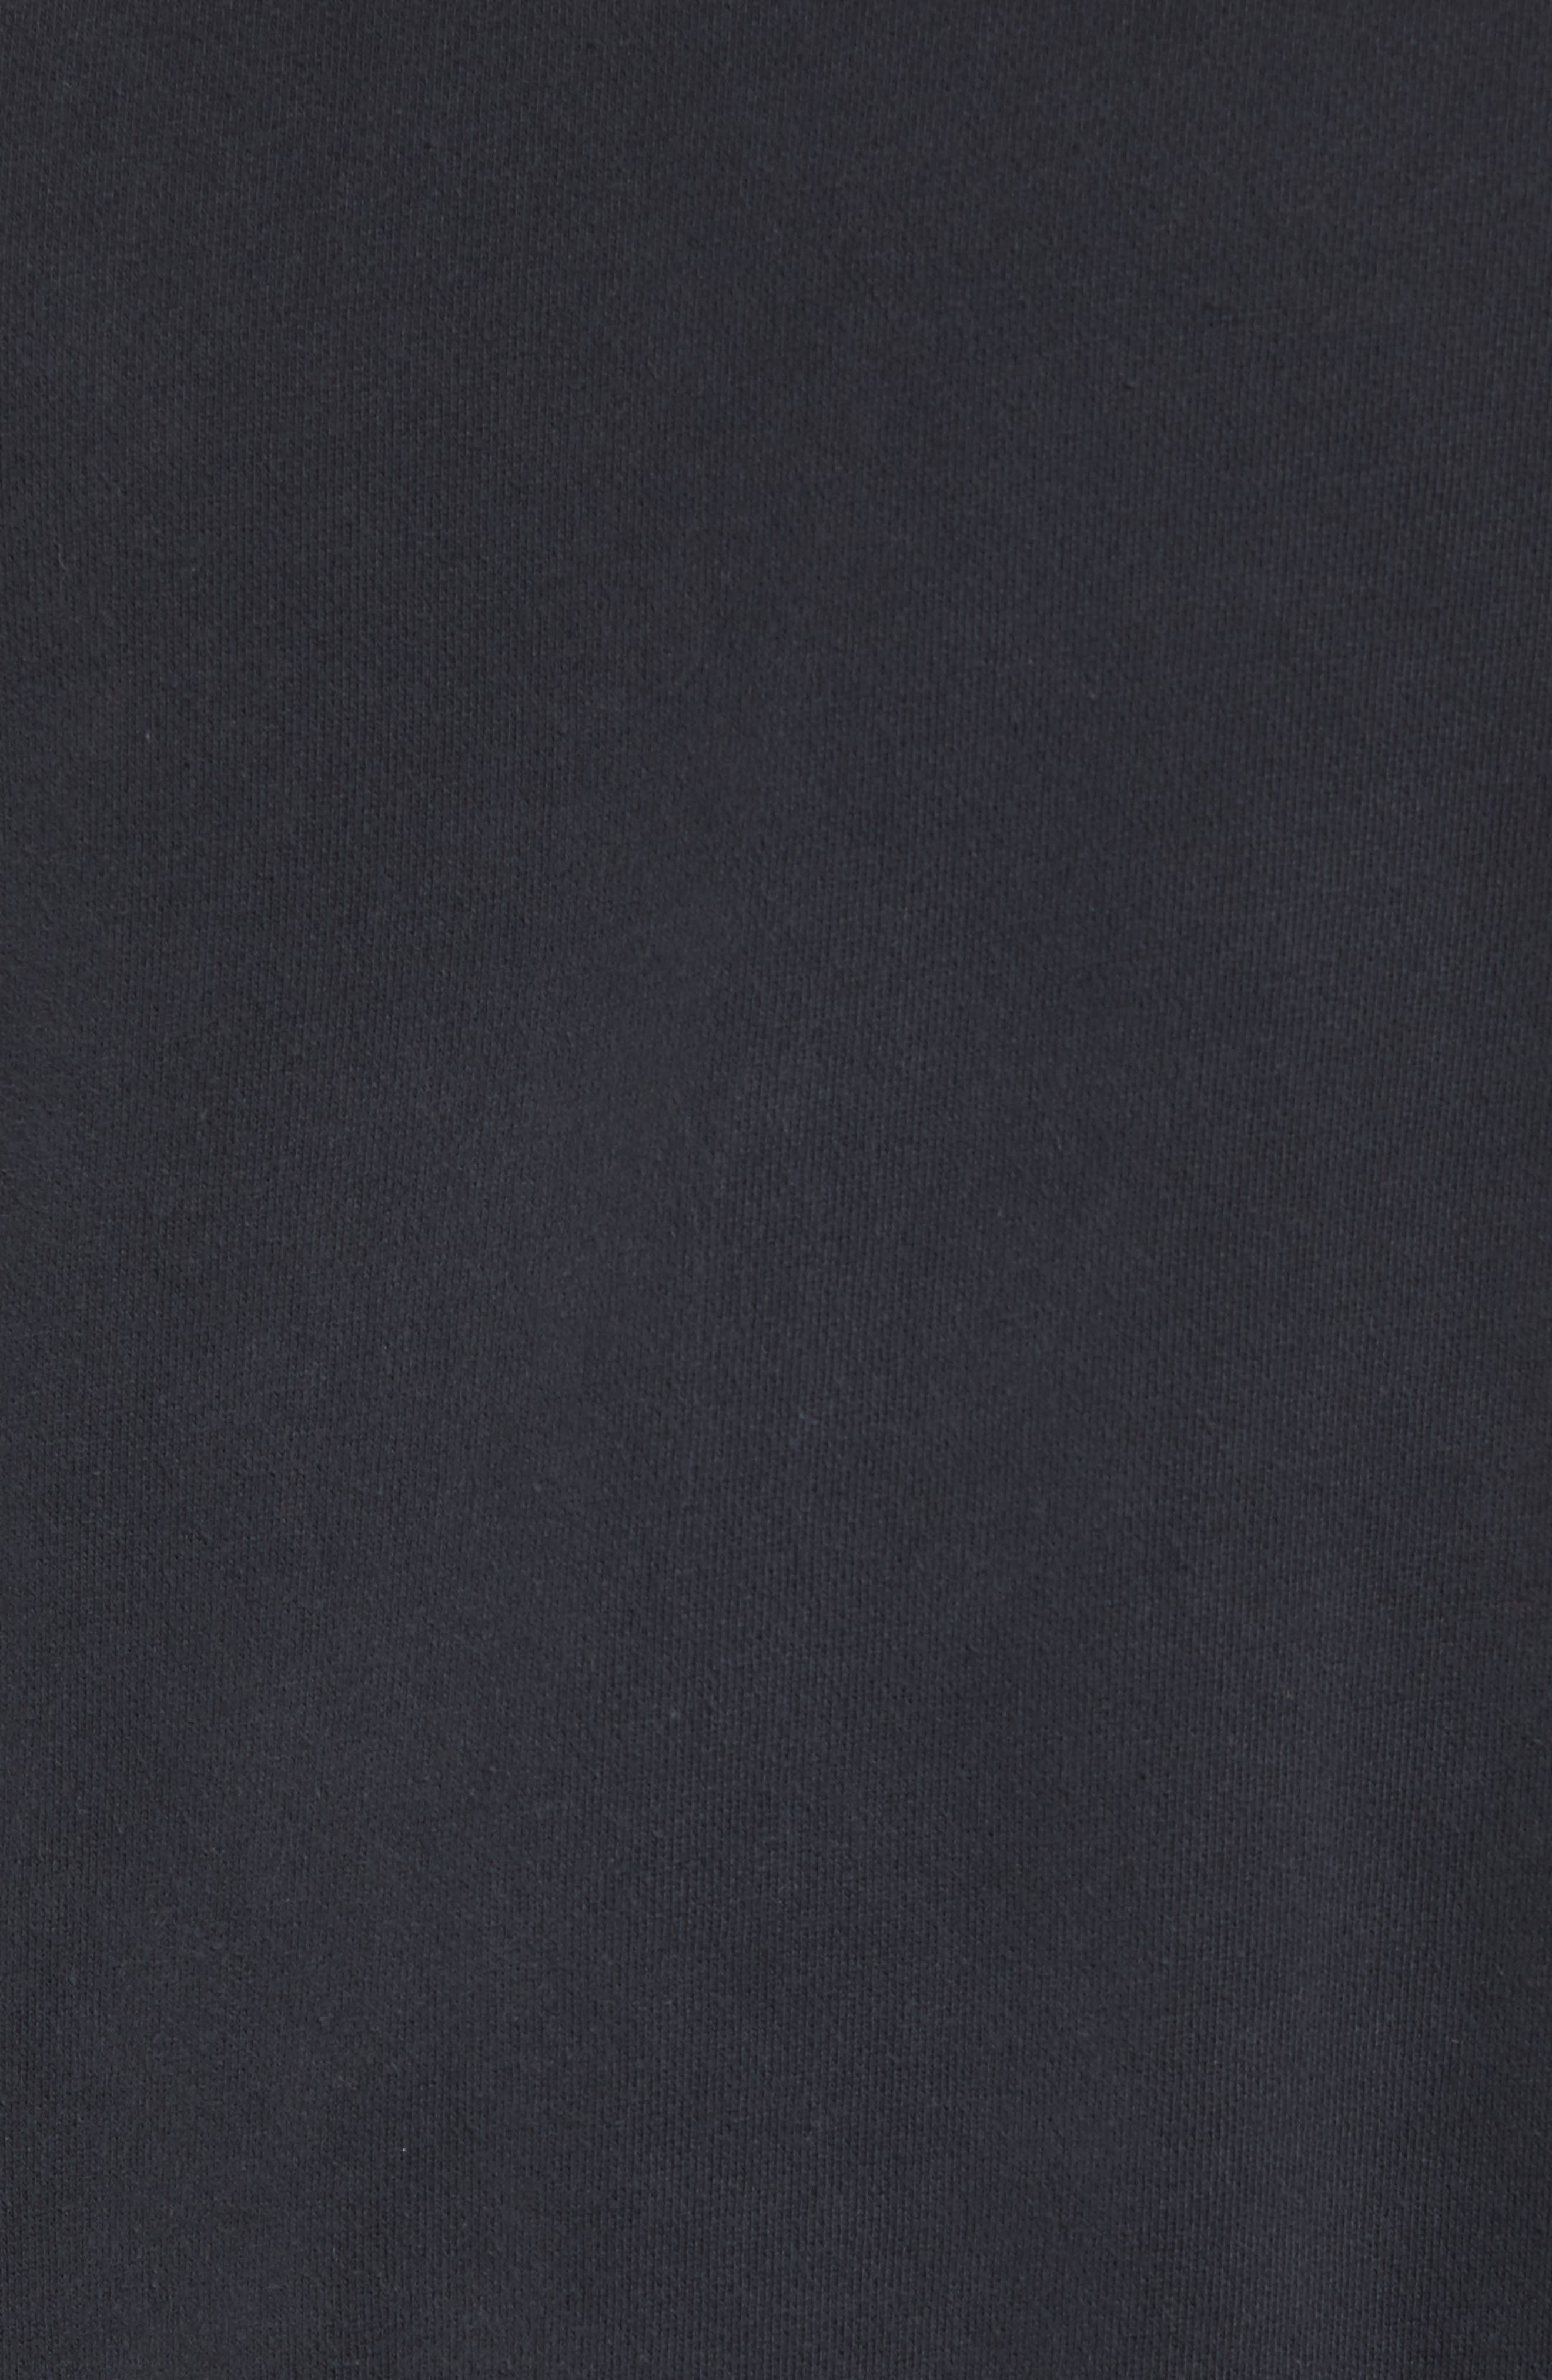 Bay Meadows Sweatshirt,                             Alternate thumbnail 5, color,                             BLACK